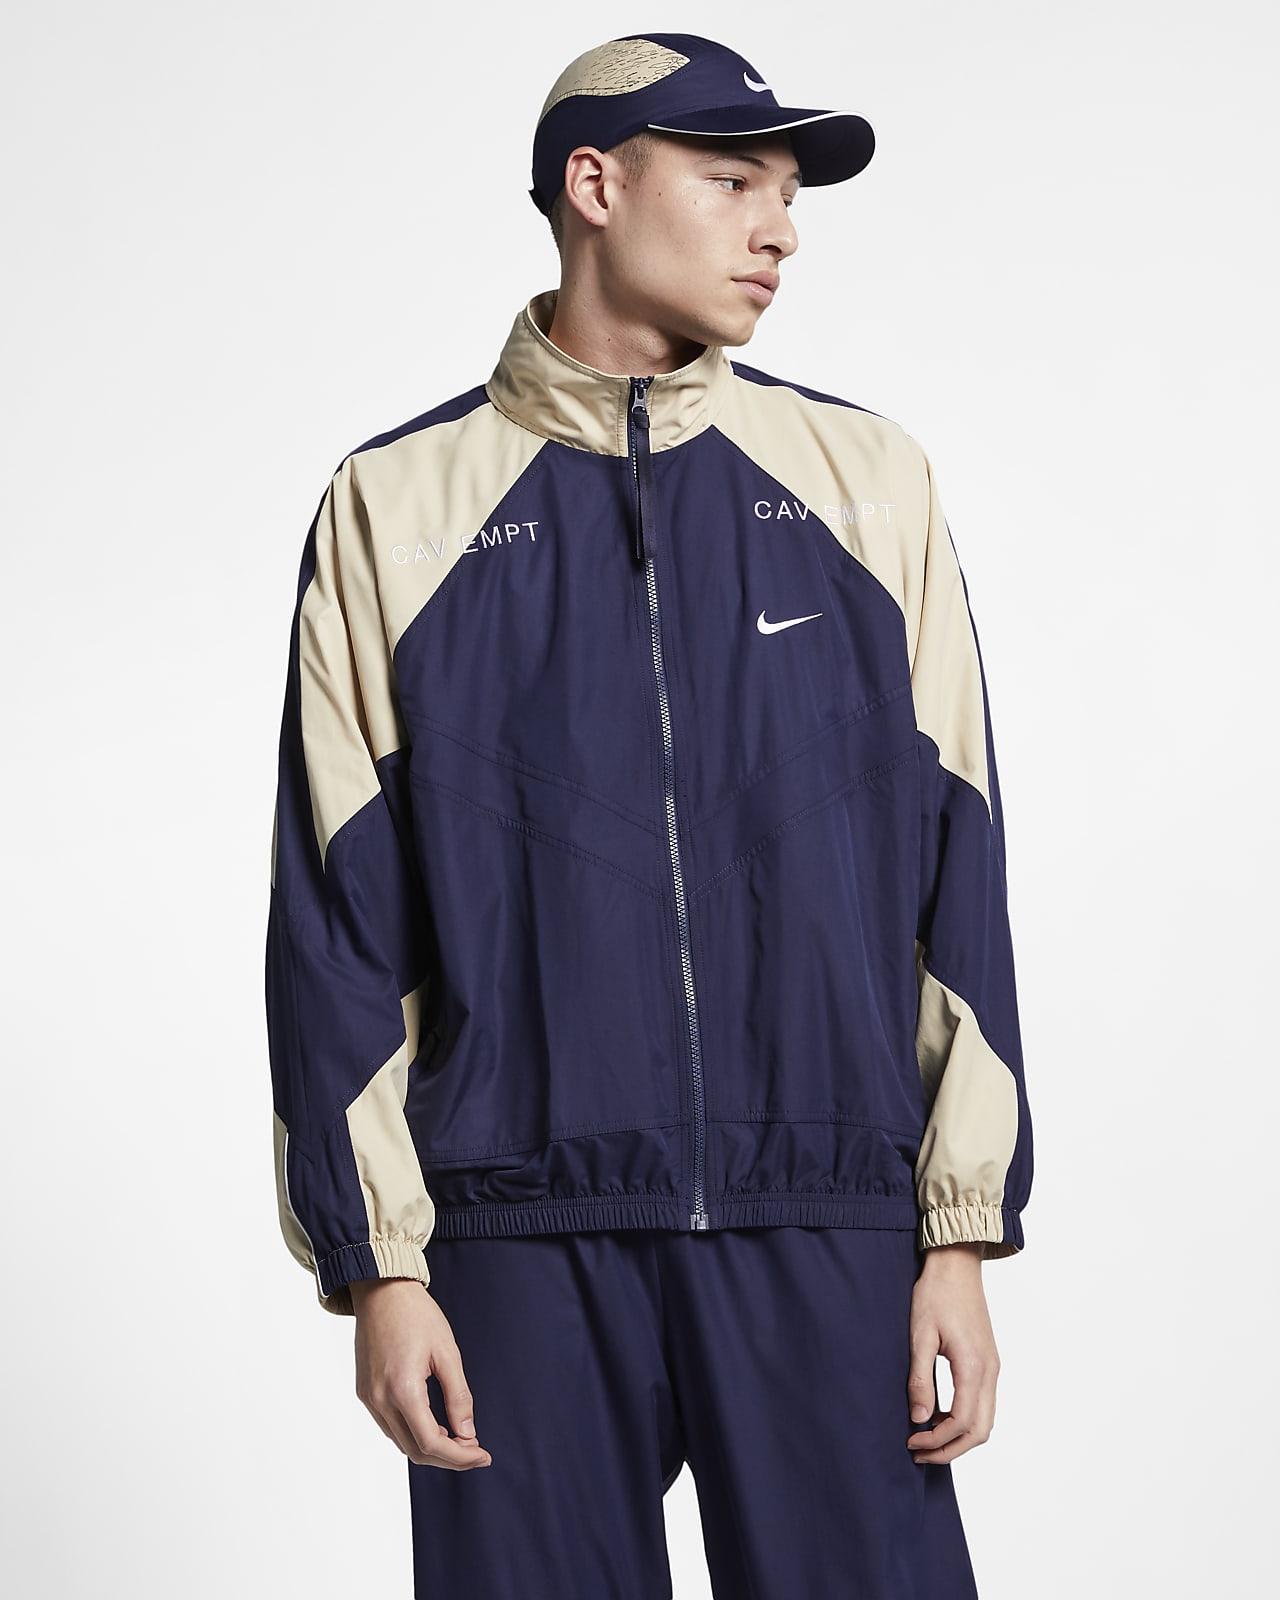 Nike x Cav Empt Men's Track Jacket. Nike IN